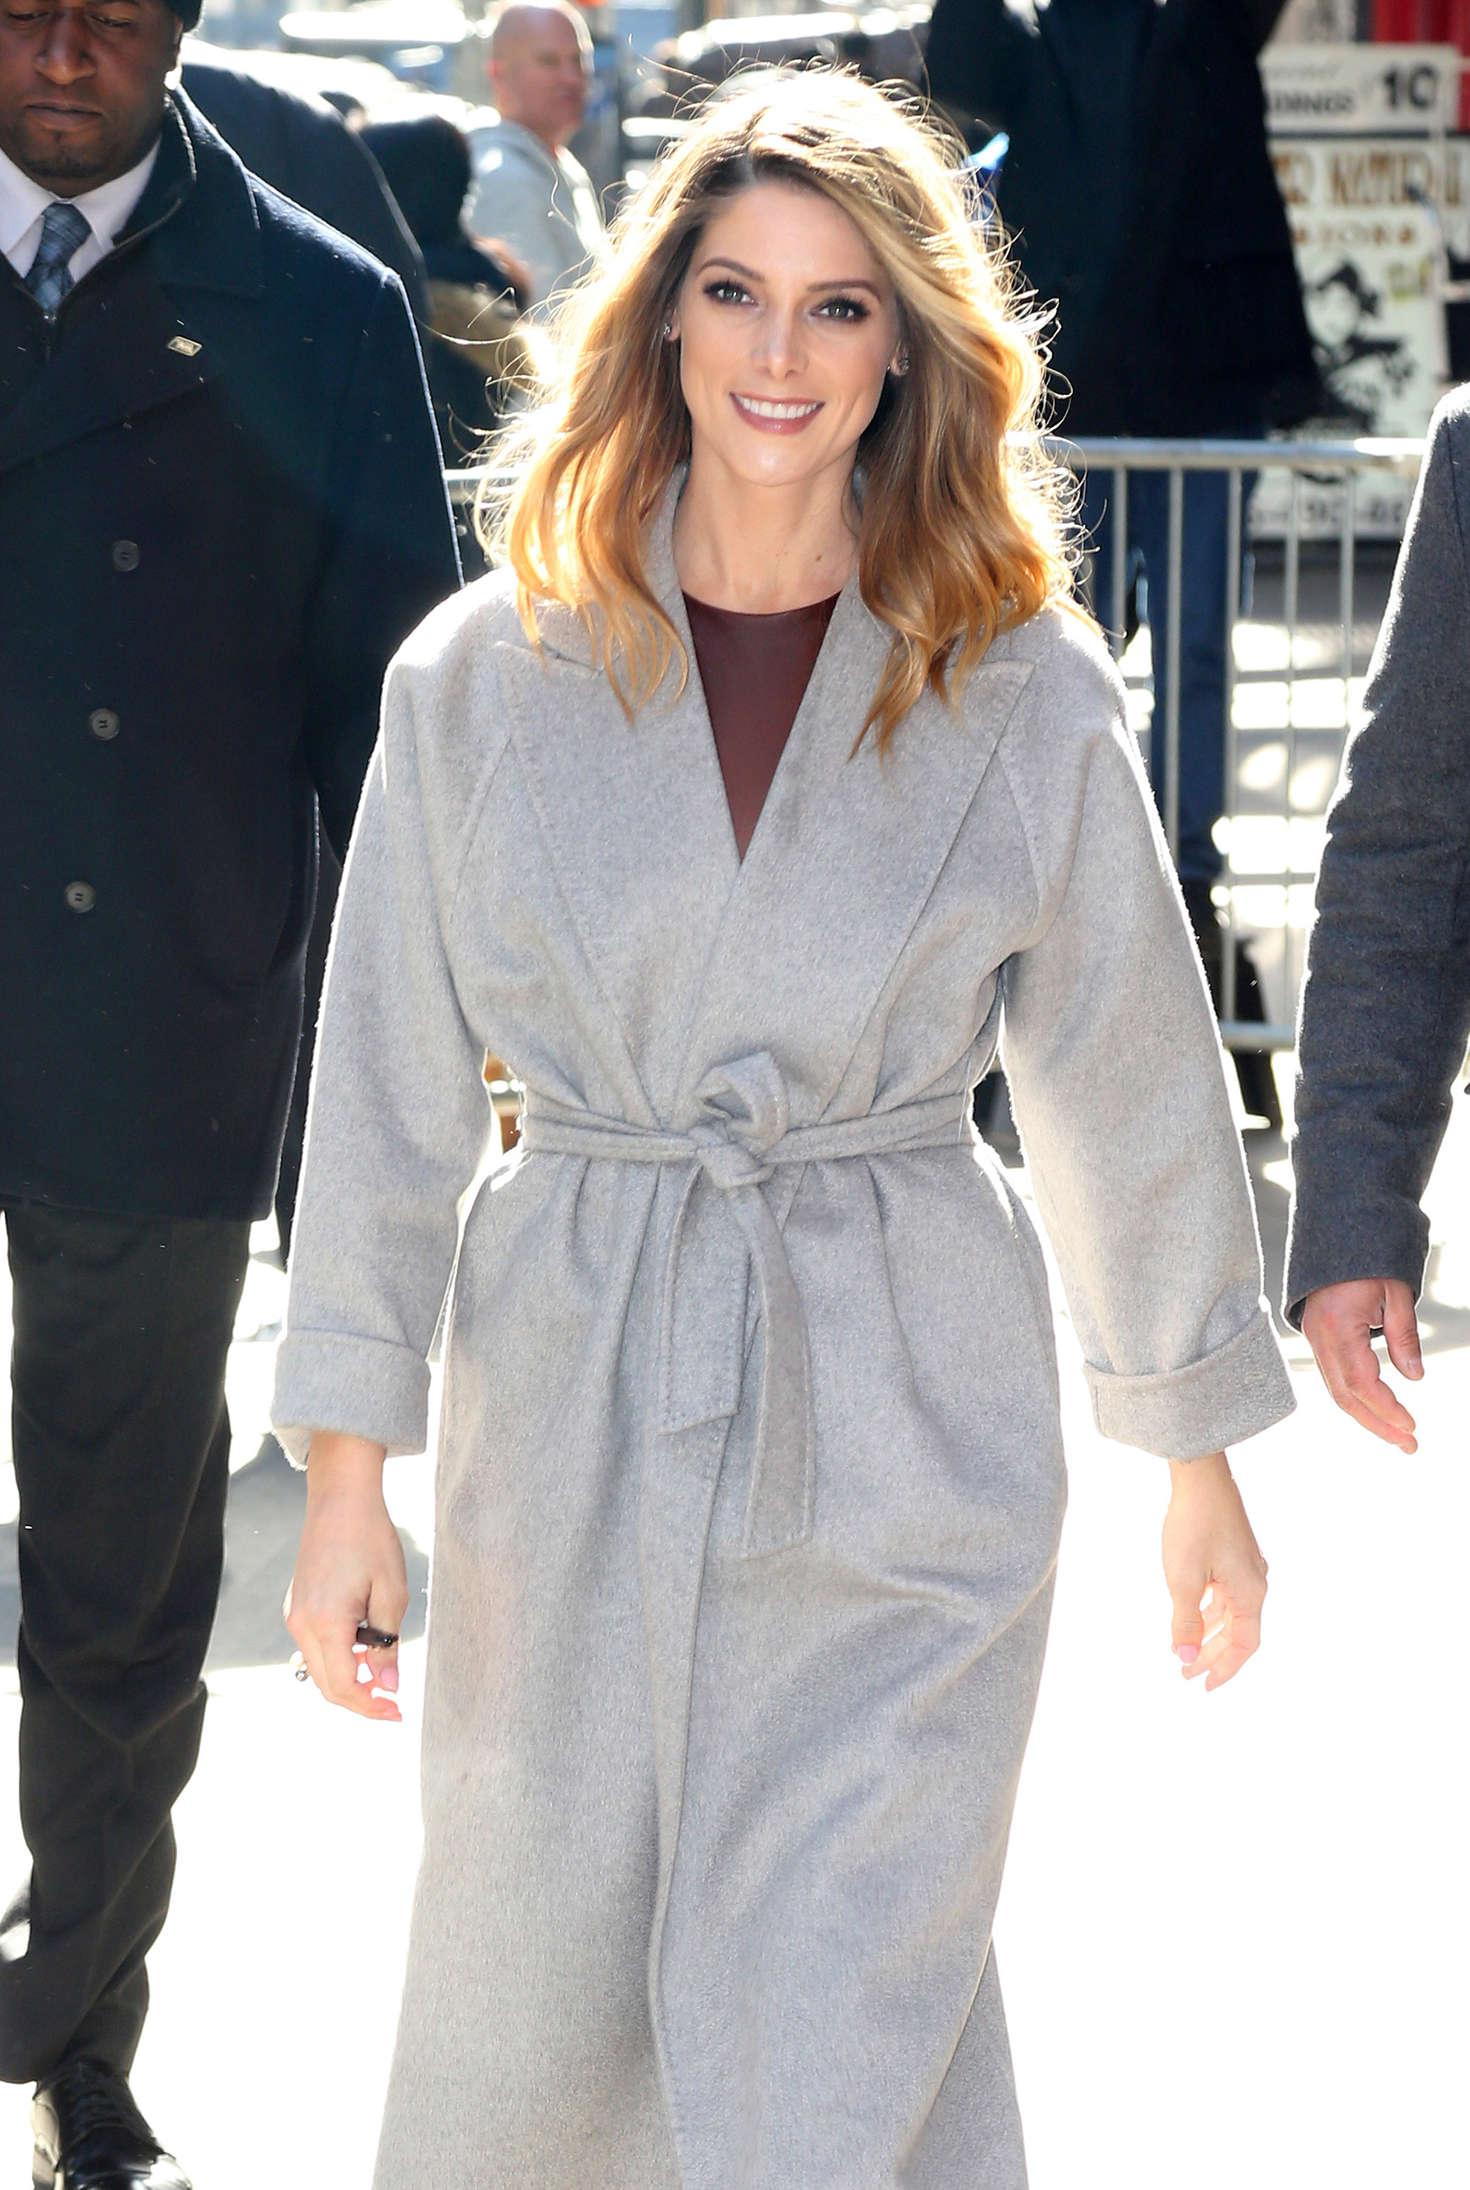 Good Morning America Latest News : Ashley greene at good morning america in new york city